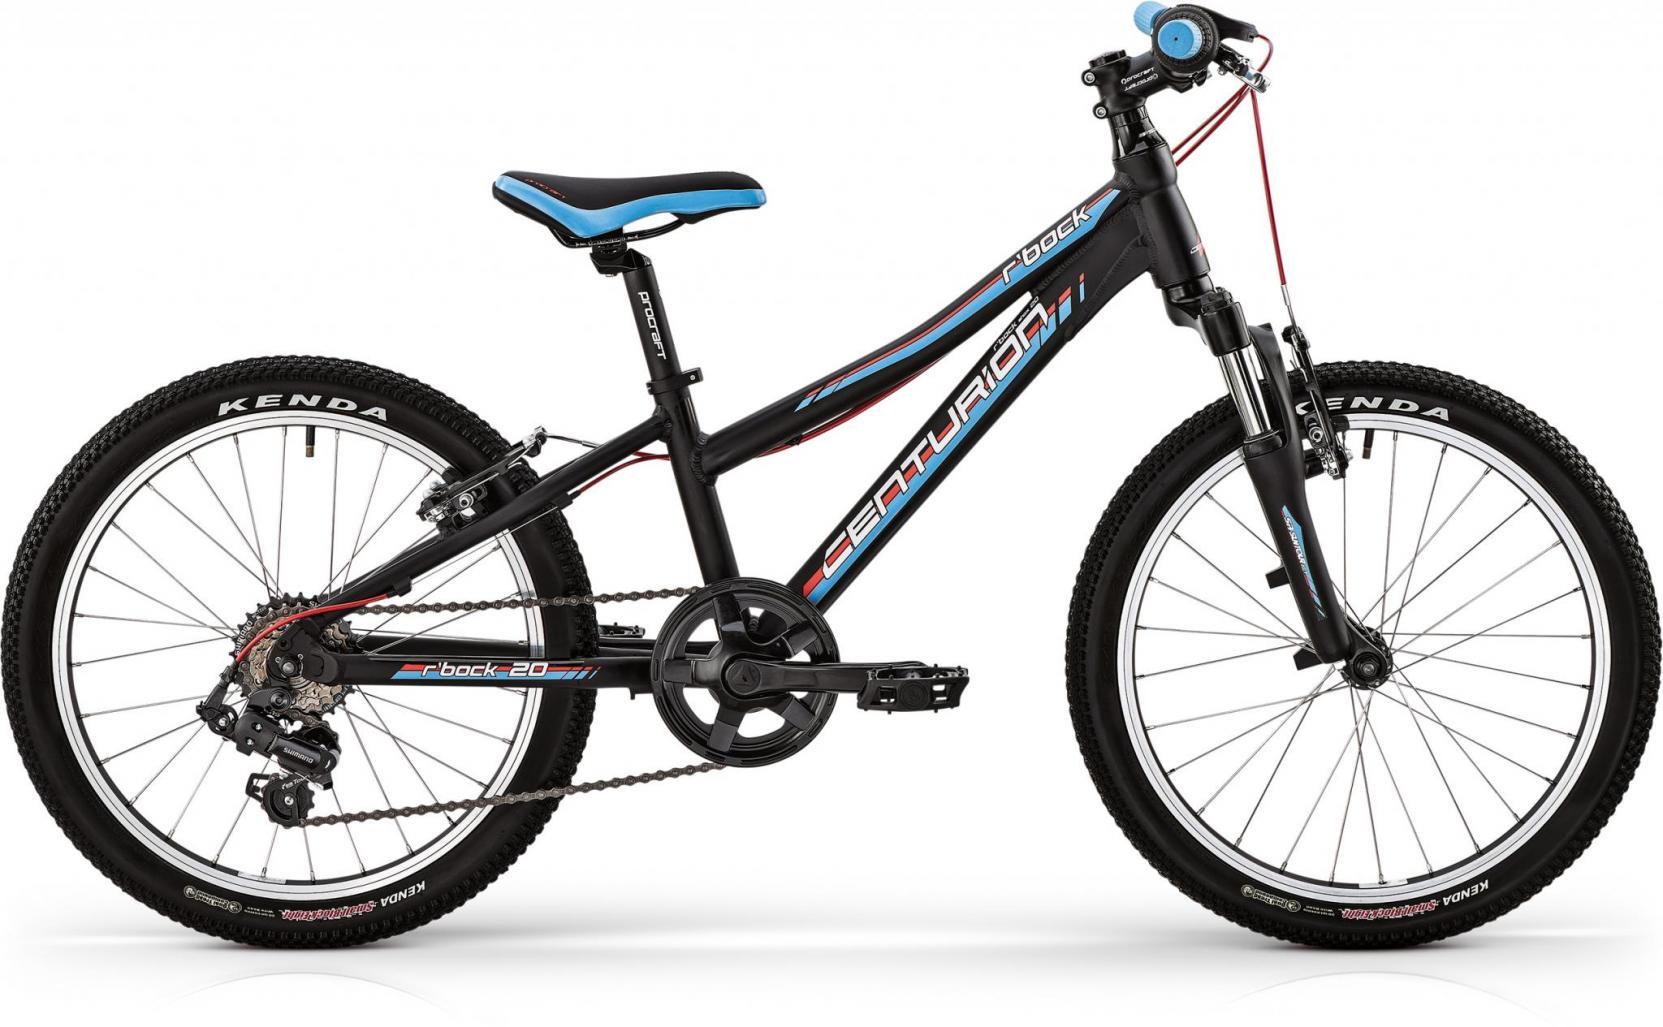 Centurion R´Bock 20 Shox Kinder-Mountainbike